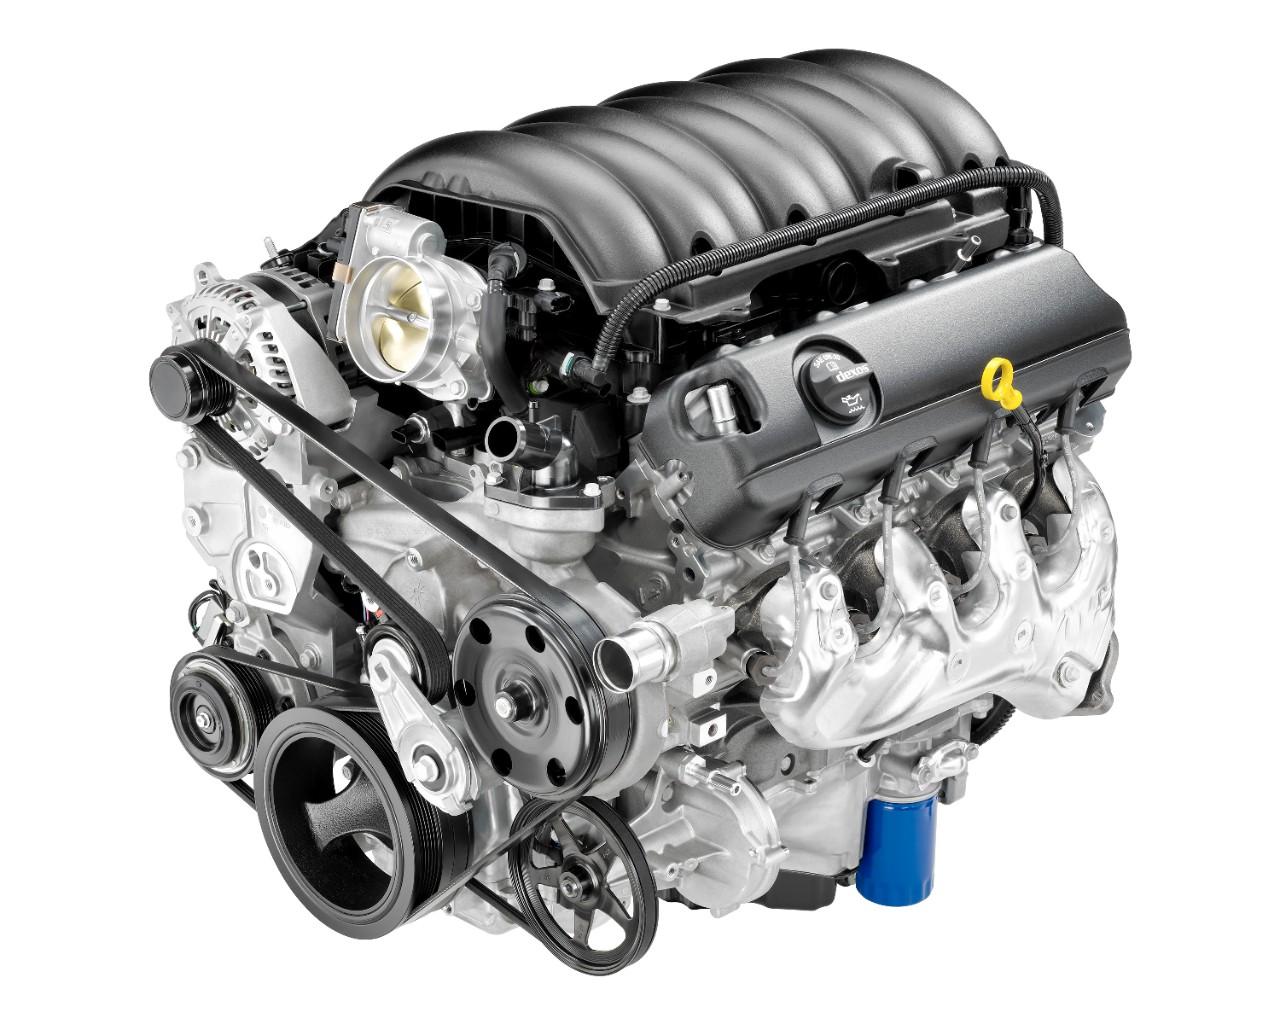 1990 gmc v6 engine diagram wiring library Chevy 4.3 V6 Engine Specs 1990 gmc v6 engine diagram